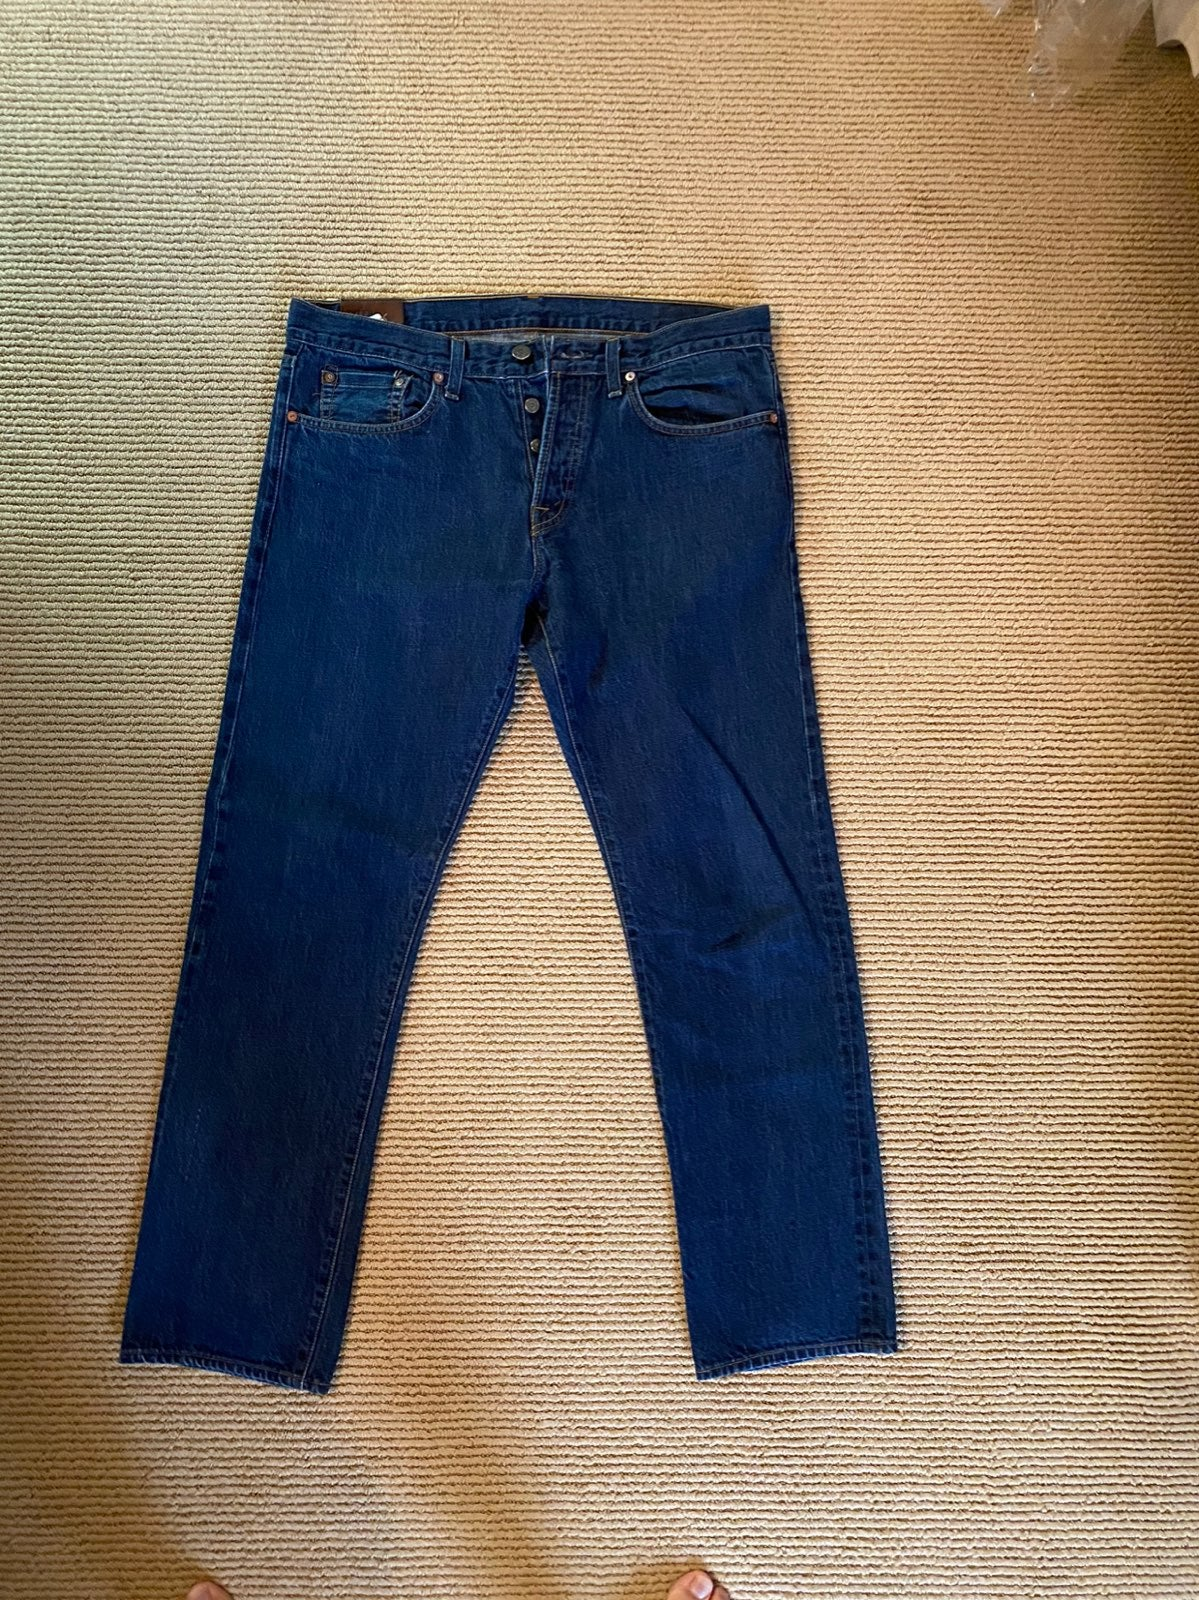 Jbrand mens 36 jeans